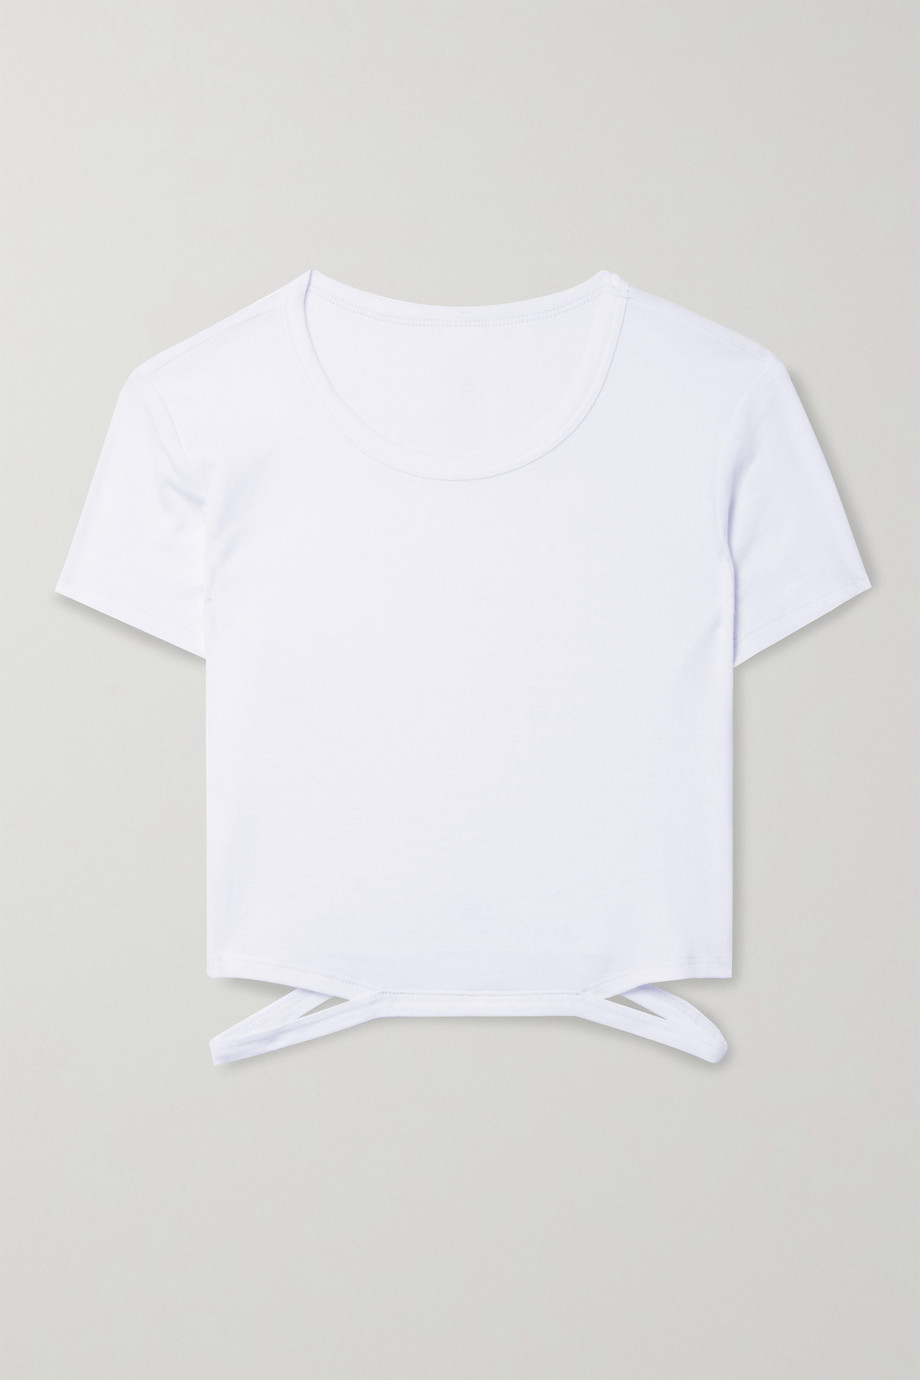 Alo Yoga Halo cropped cutout jersey top